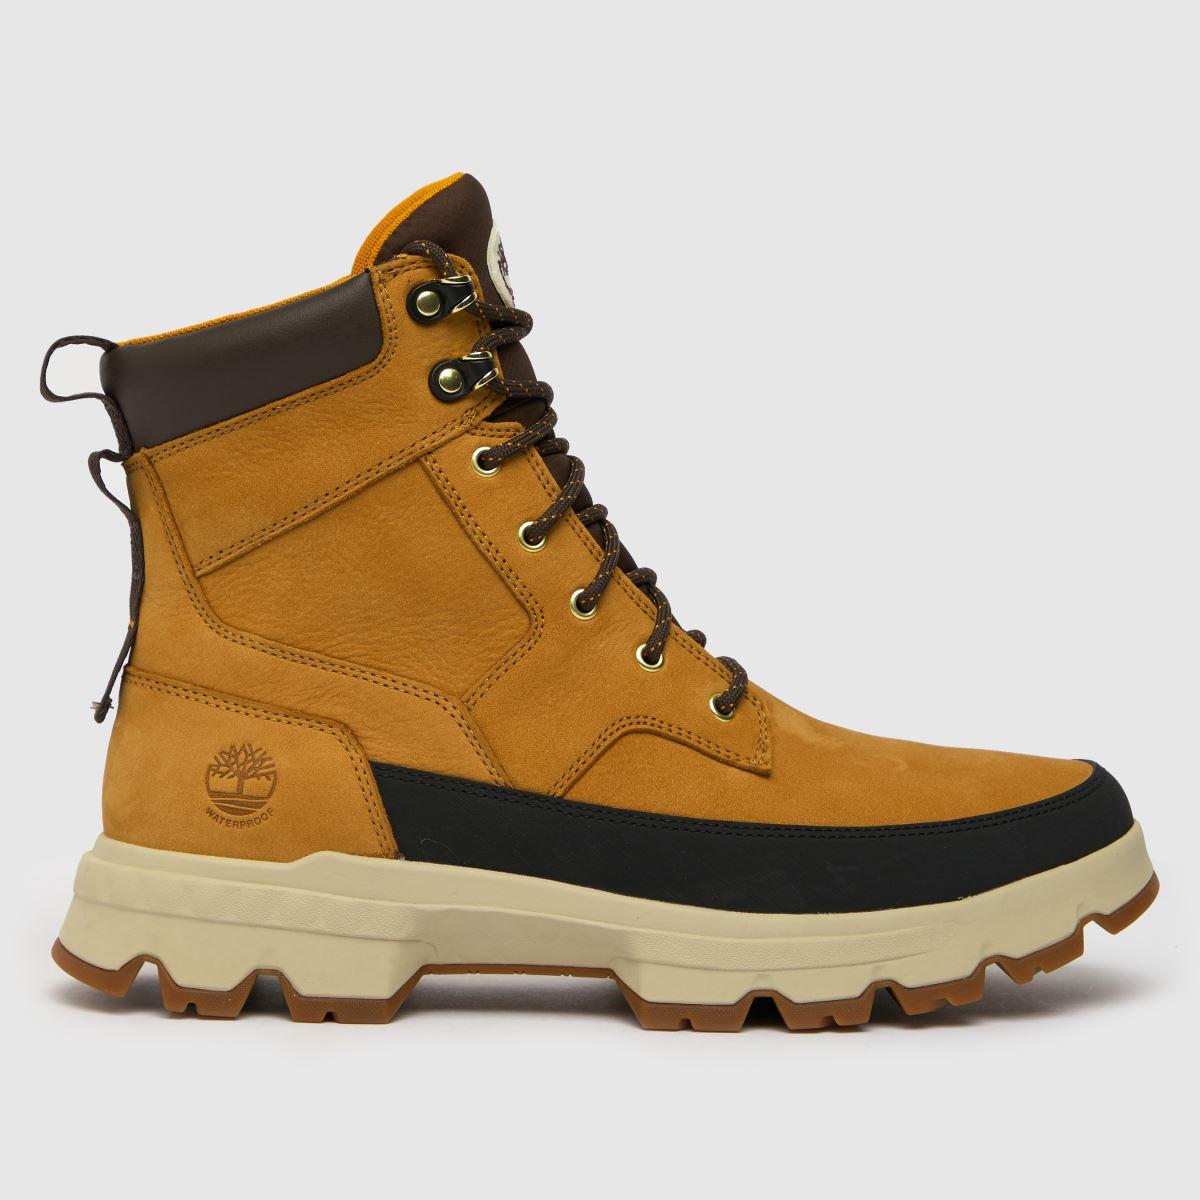 Timberland Tan Ultra Waterproof Boots